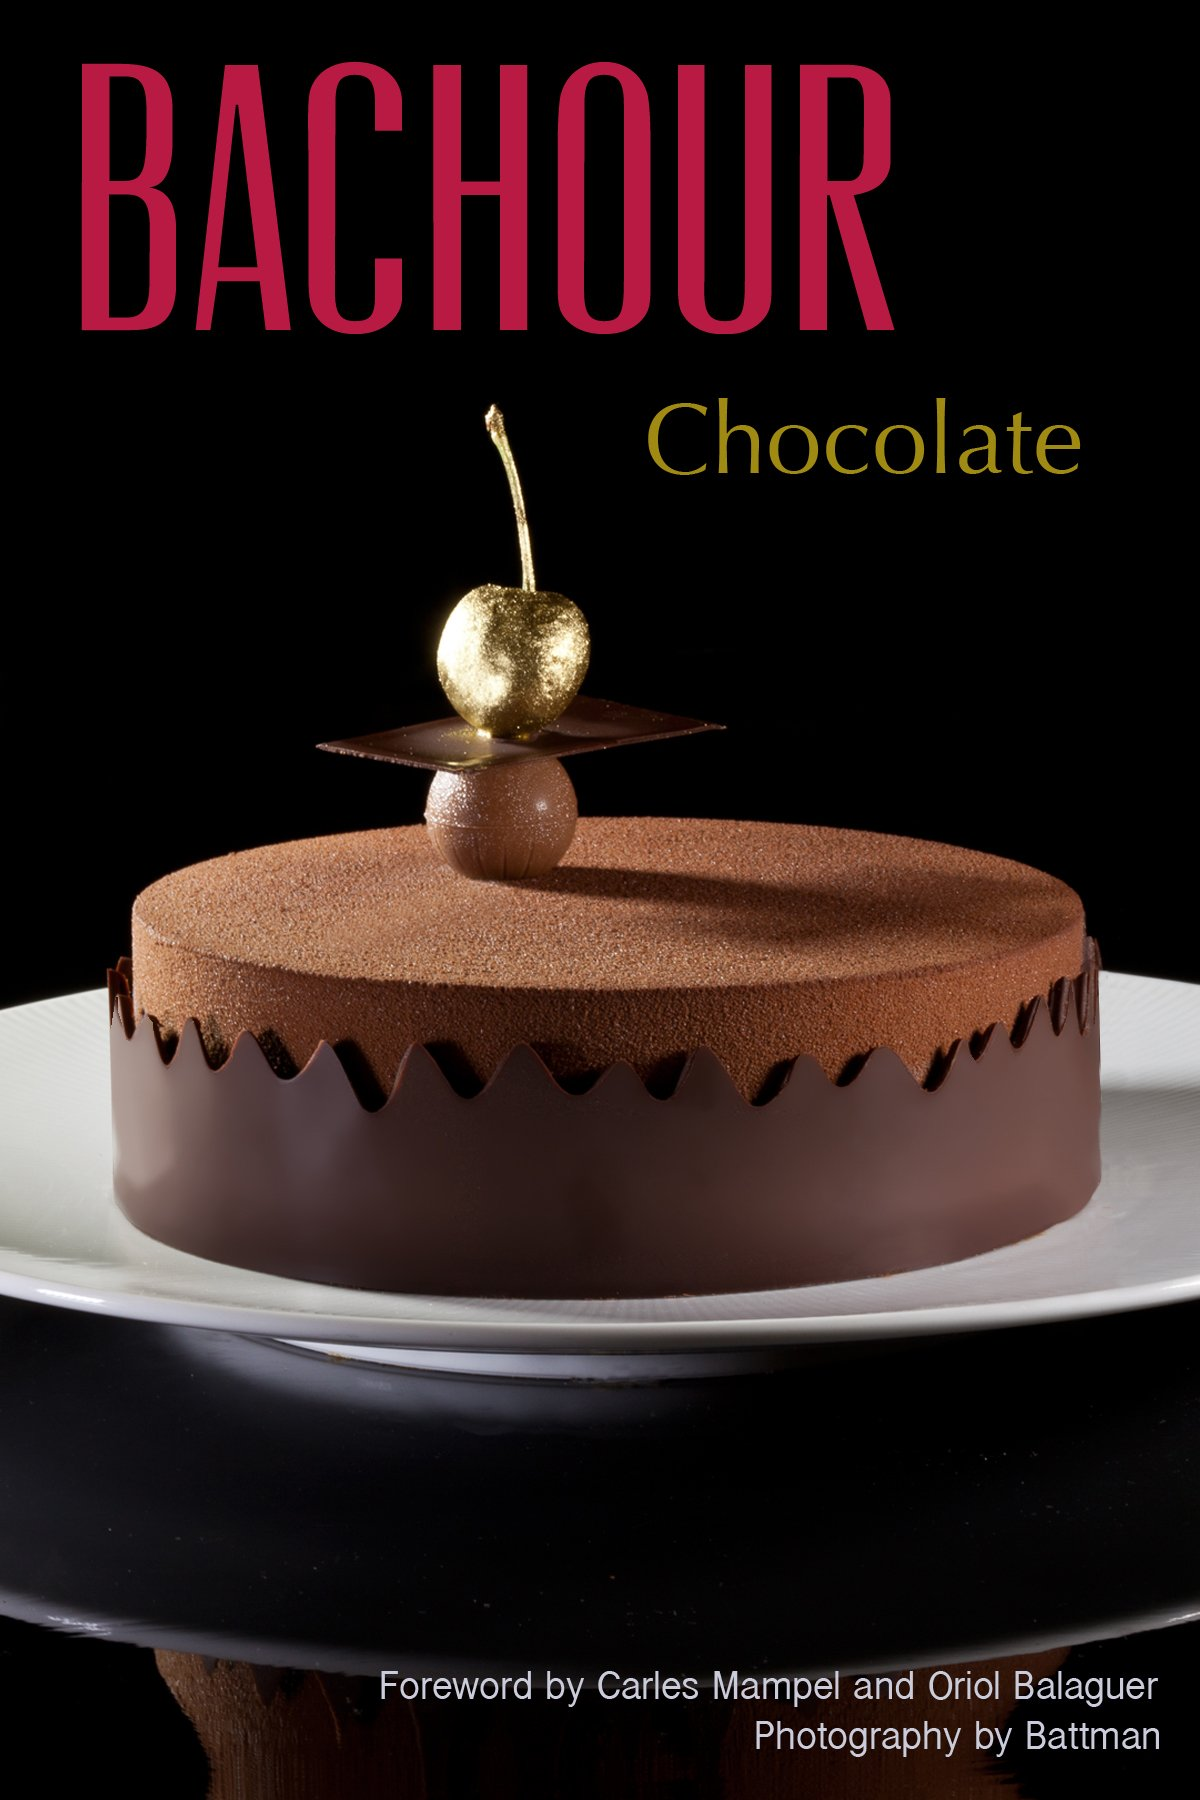 antonio bachour book free